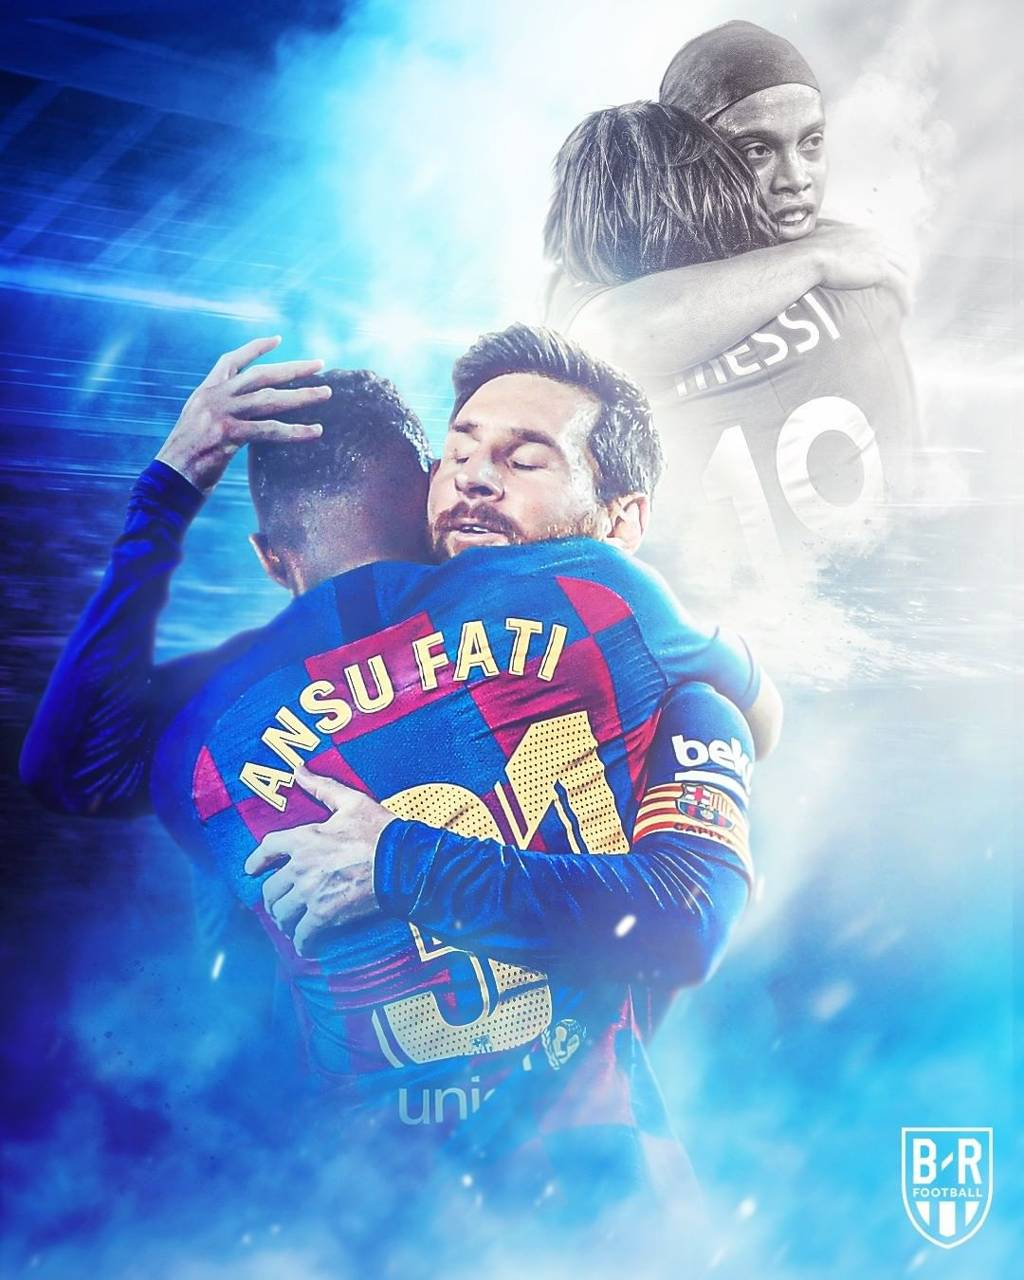 Messi Fati Wallpaper By Harshiludani 11 Free On Zedge